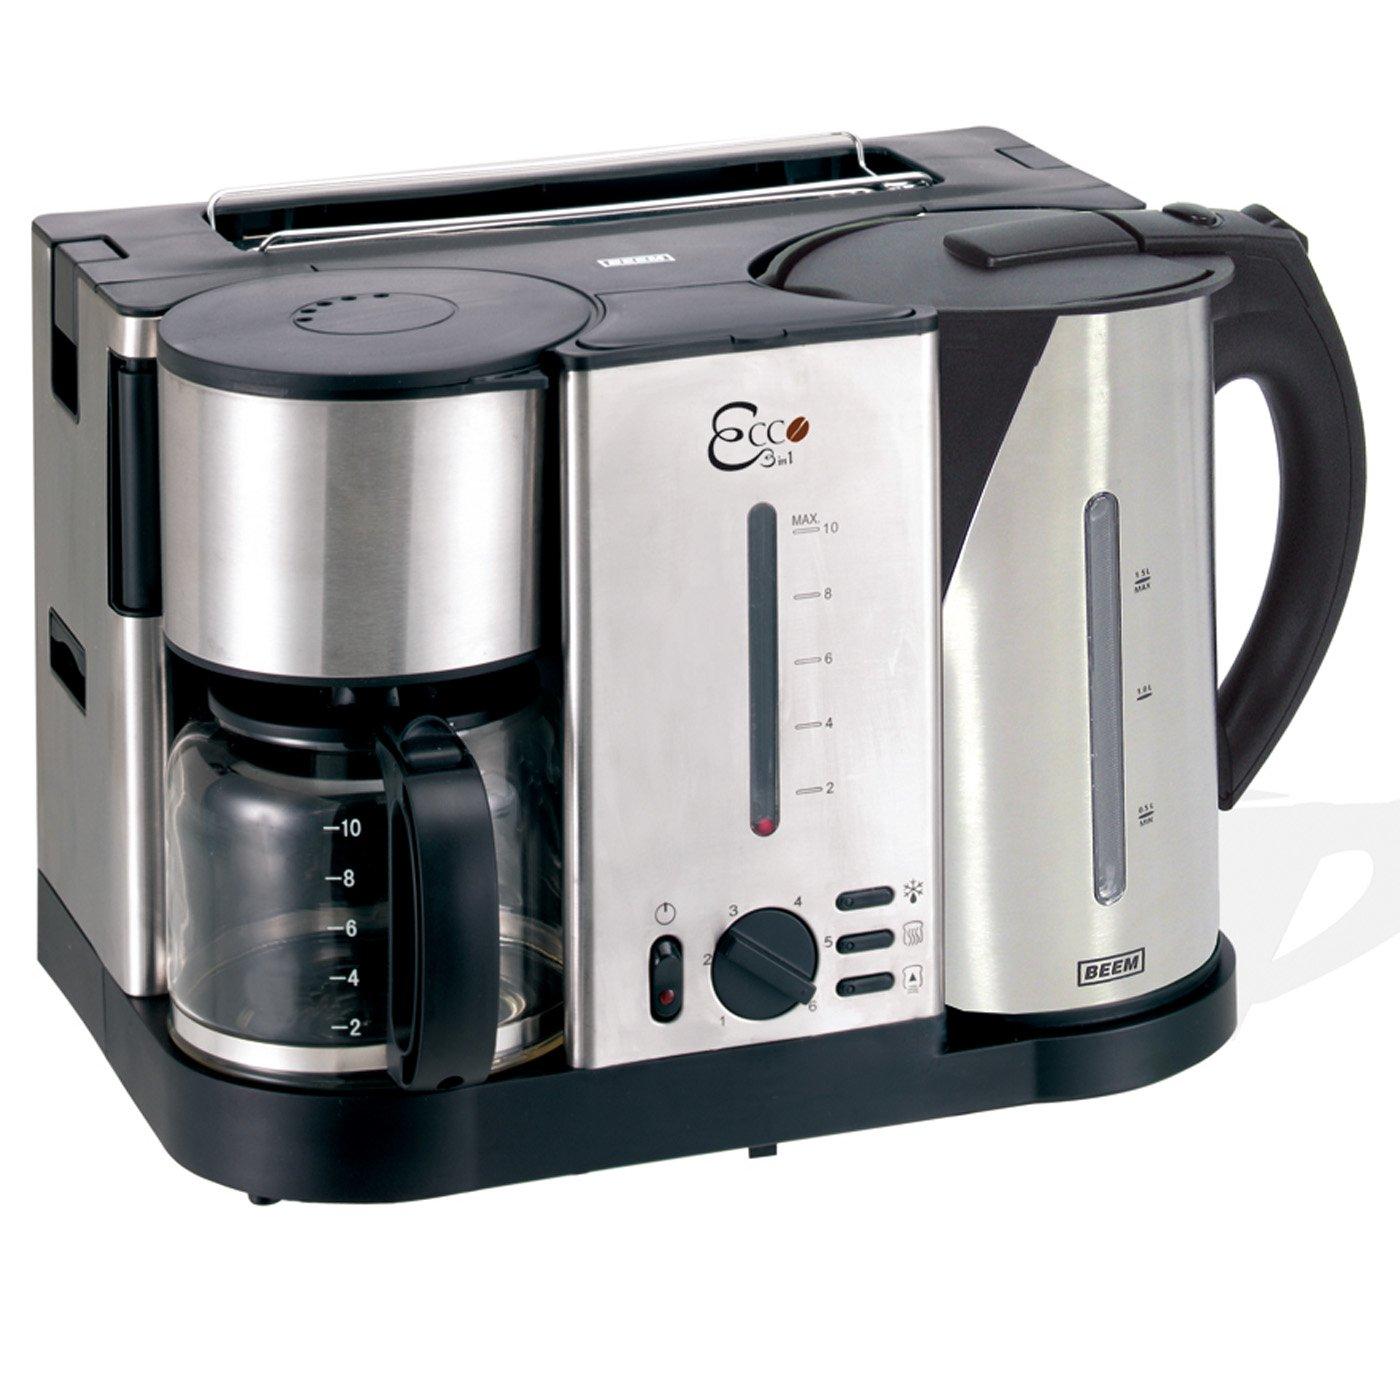 Beem 3 In 1 Ecco Stainless Steel Breakfast Machine, 15 Litre, 3750